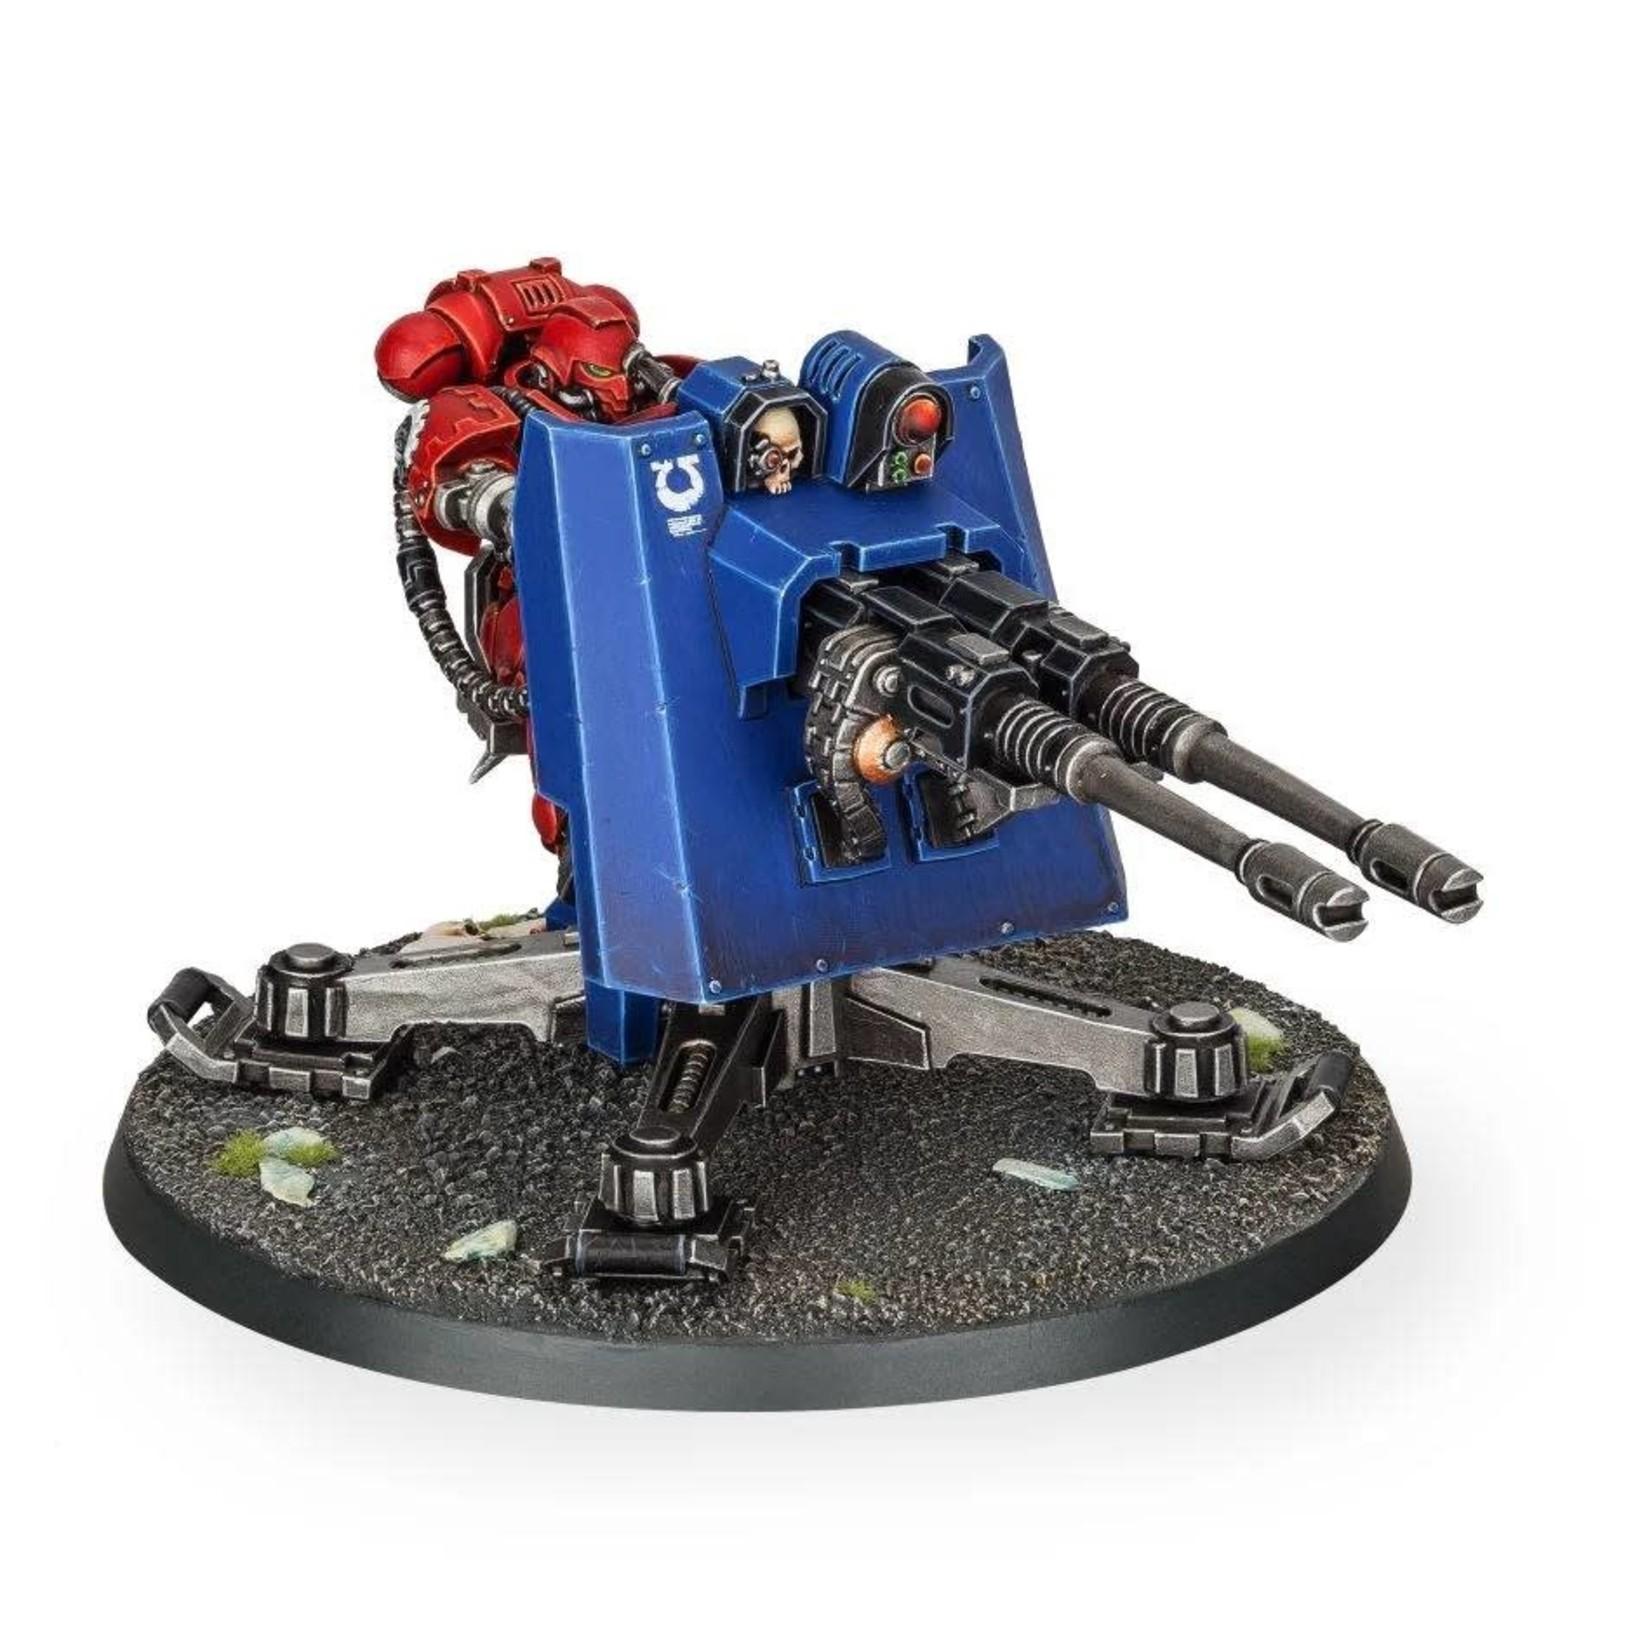 Games Workshop Warhammer 40k: Space Marines - Primaris Firestrike Servo-turret